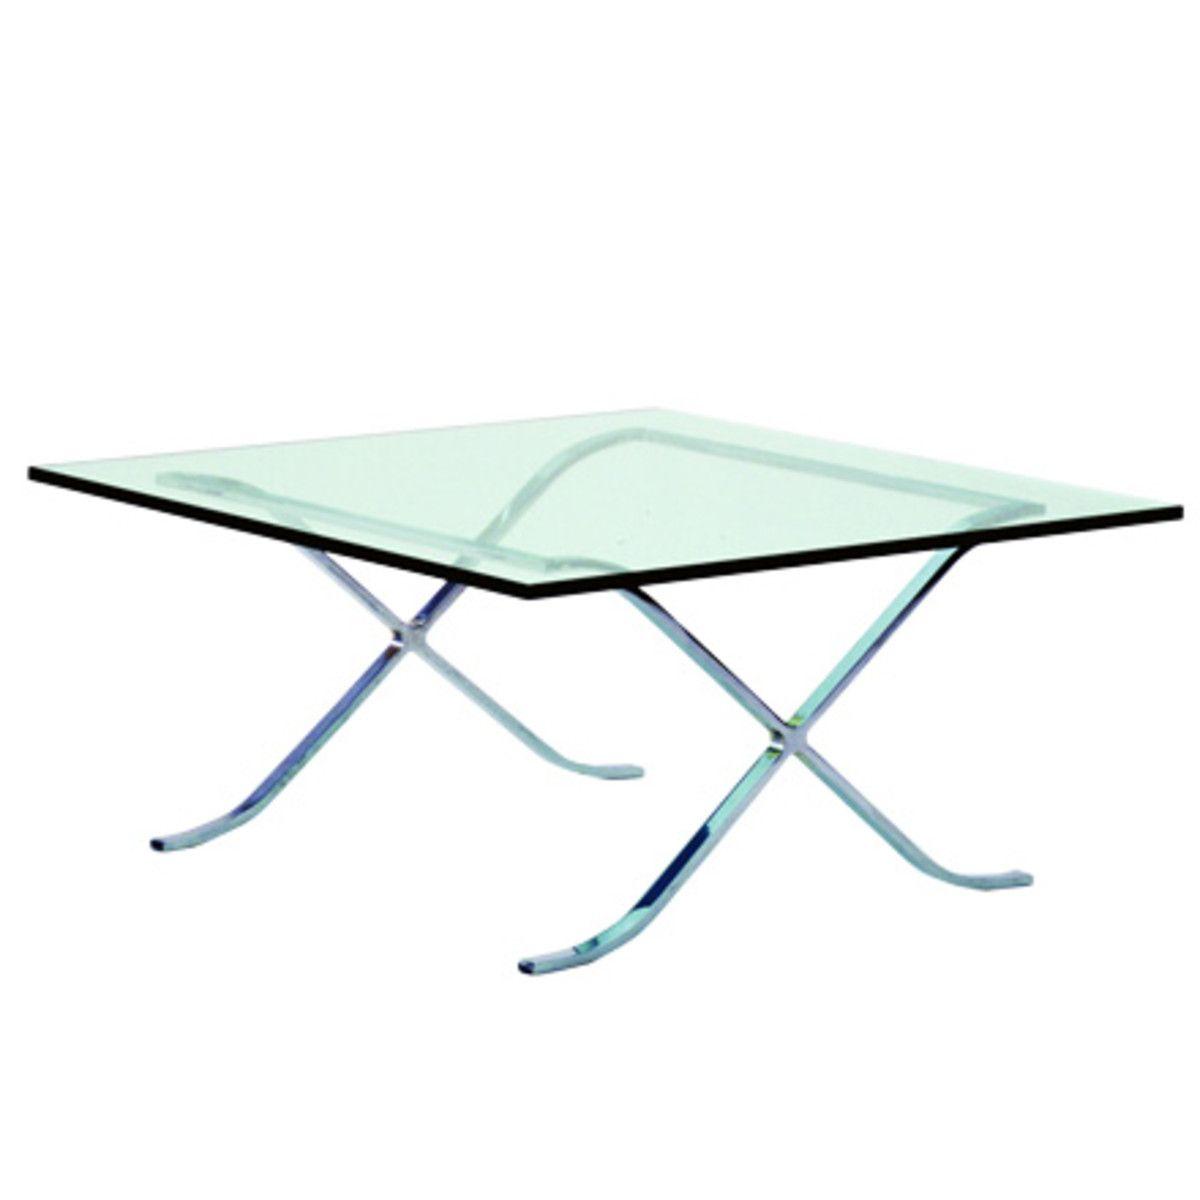 Legendary Furniture Design By Mies Van Der Rohe